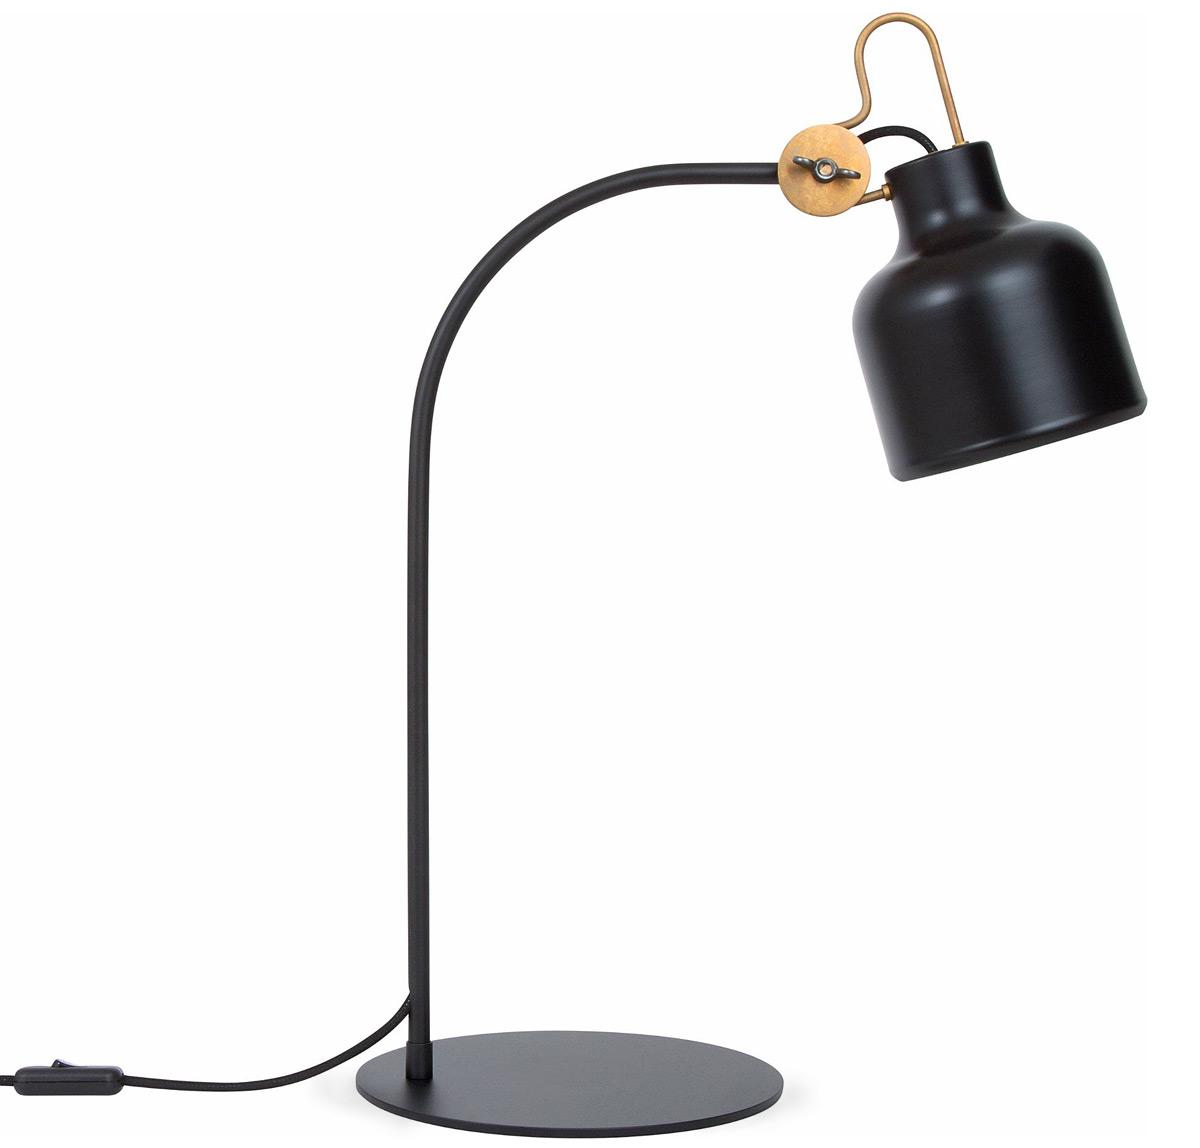 Skandinavische design tischlampe aus messing bold casa lumi for Skandinavische design